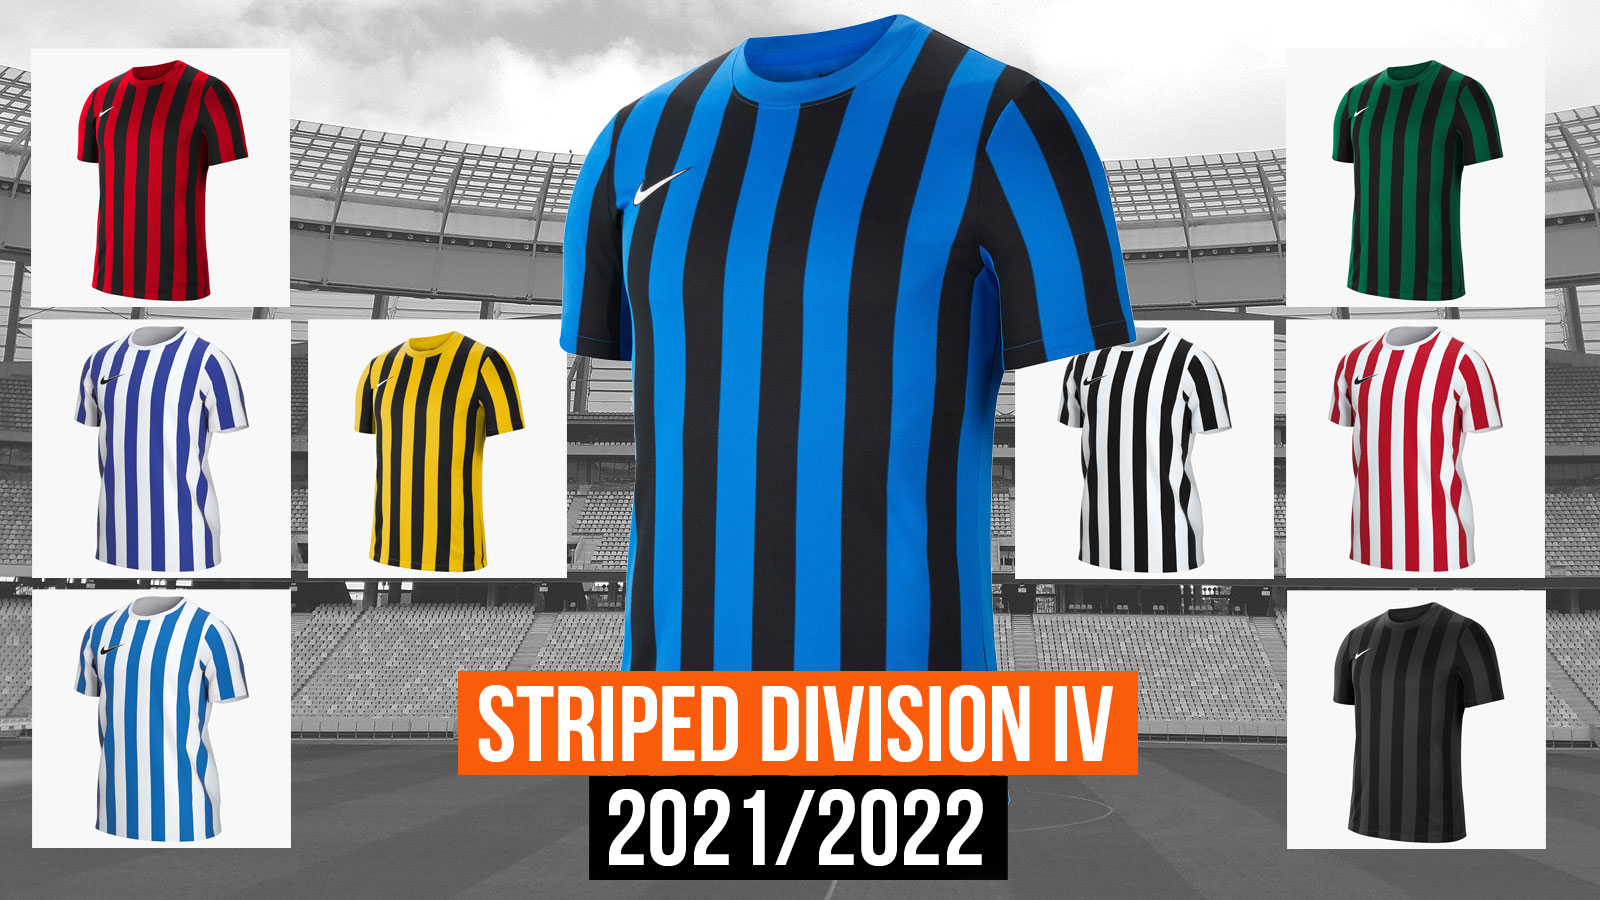 Das Nike Striped Division IV Trikot für 2021/2022/2023